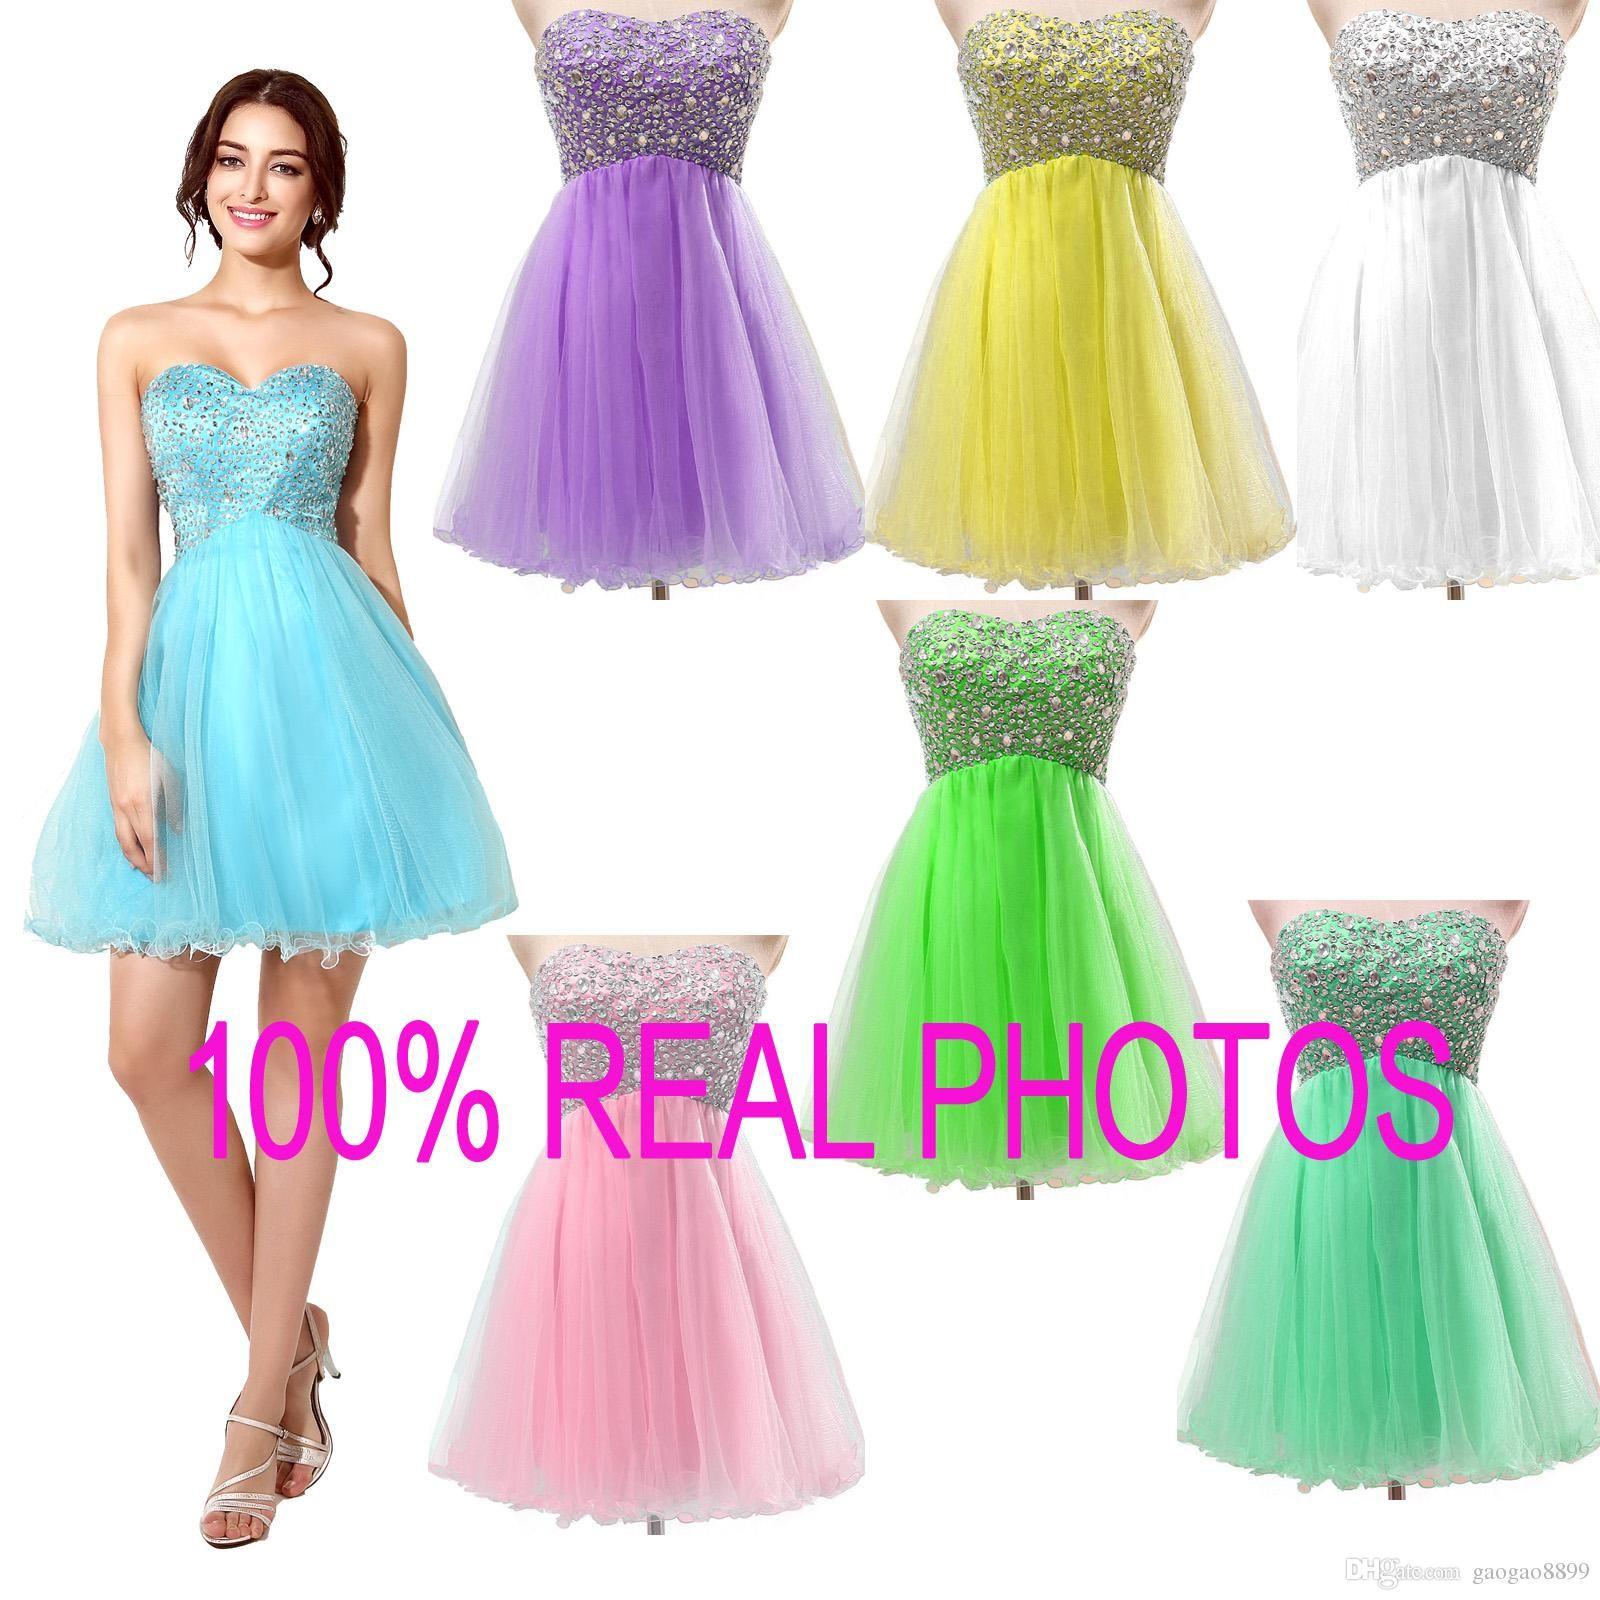 Gordmans Homecoming Dresses - Women Dress Image